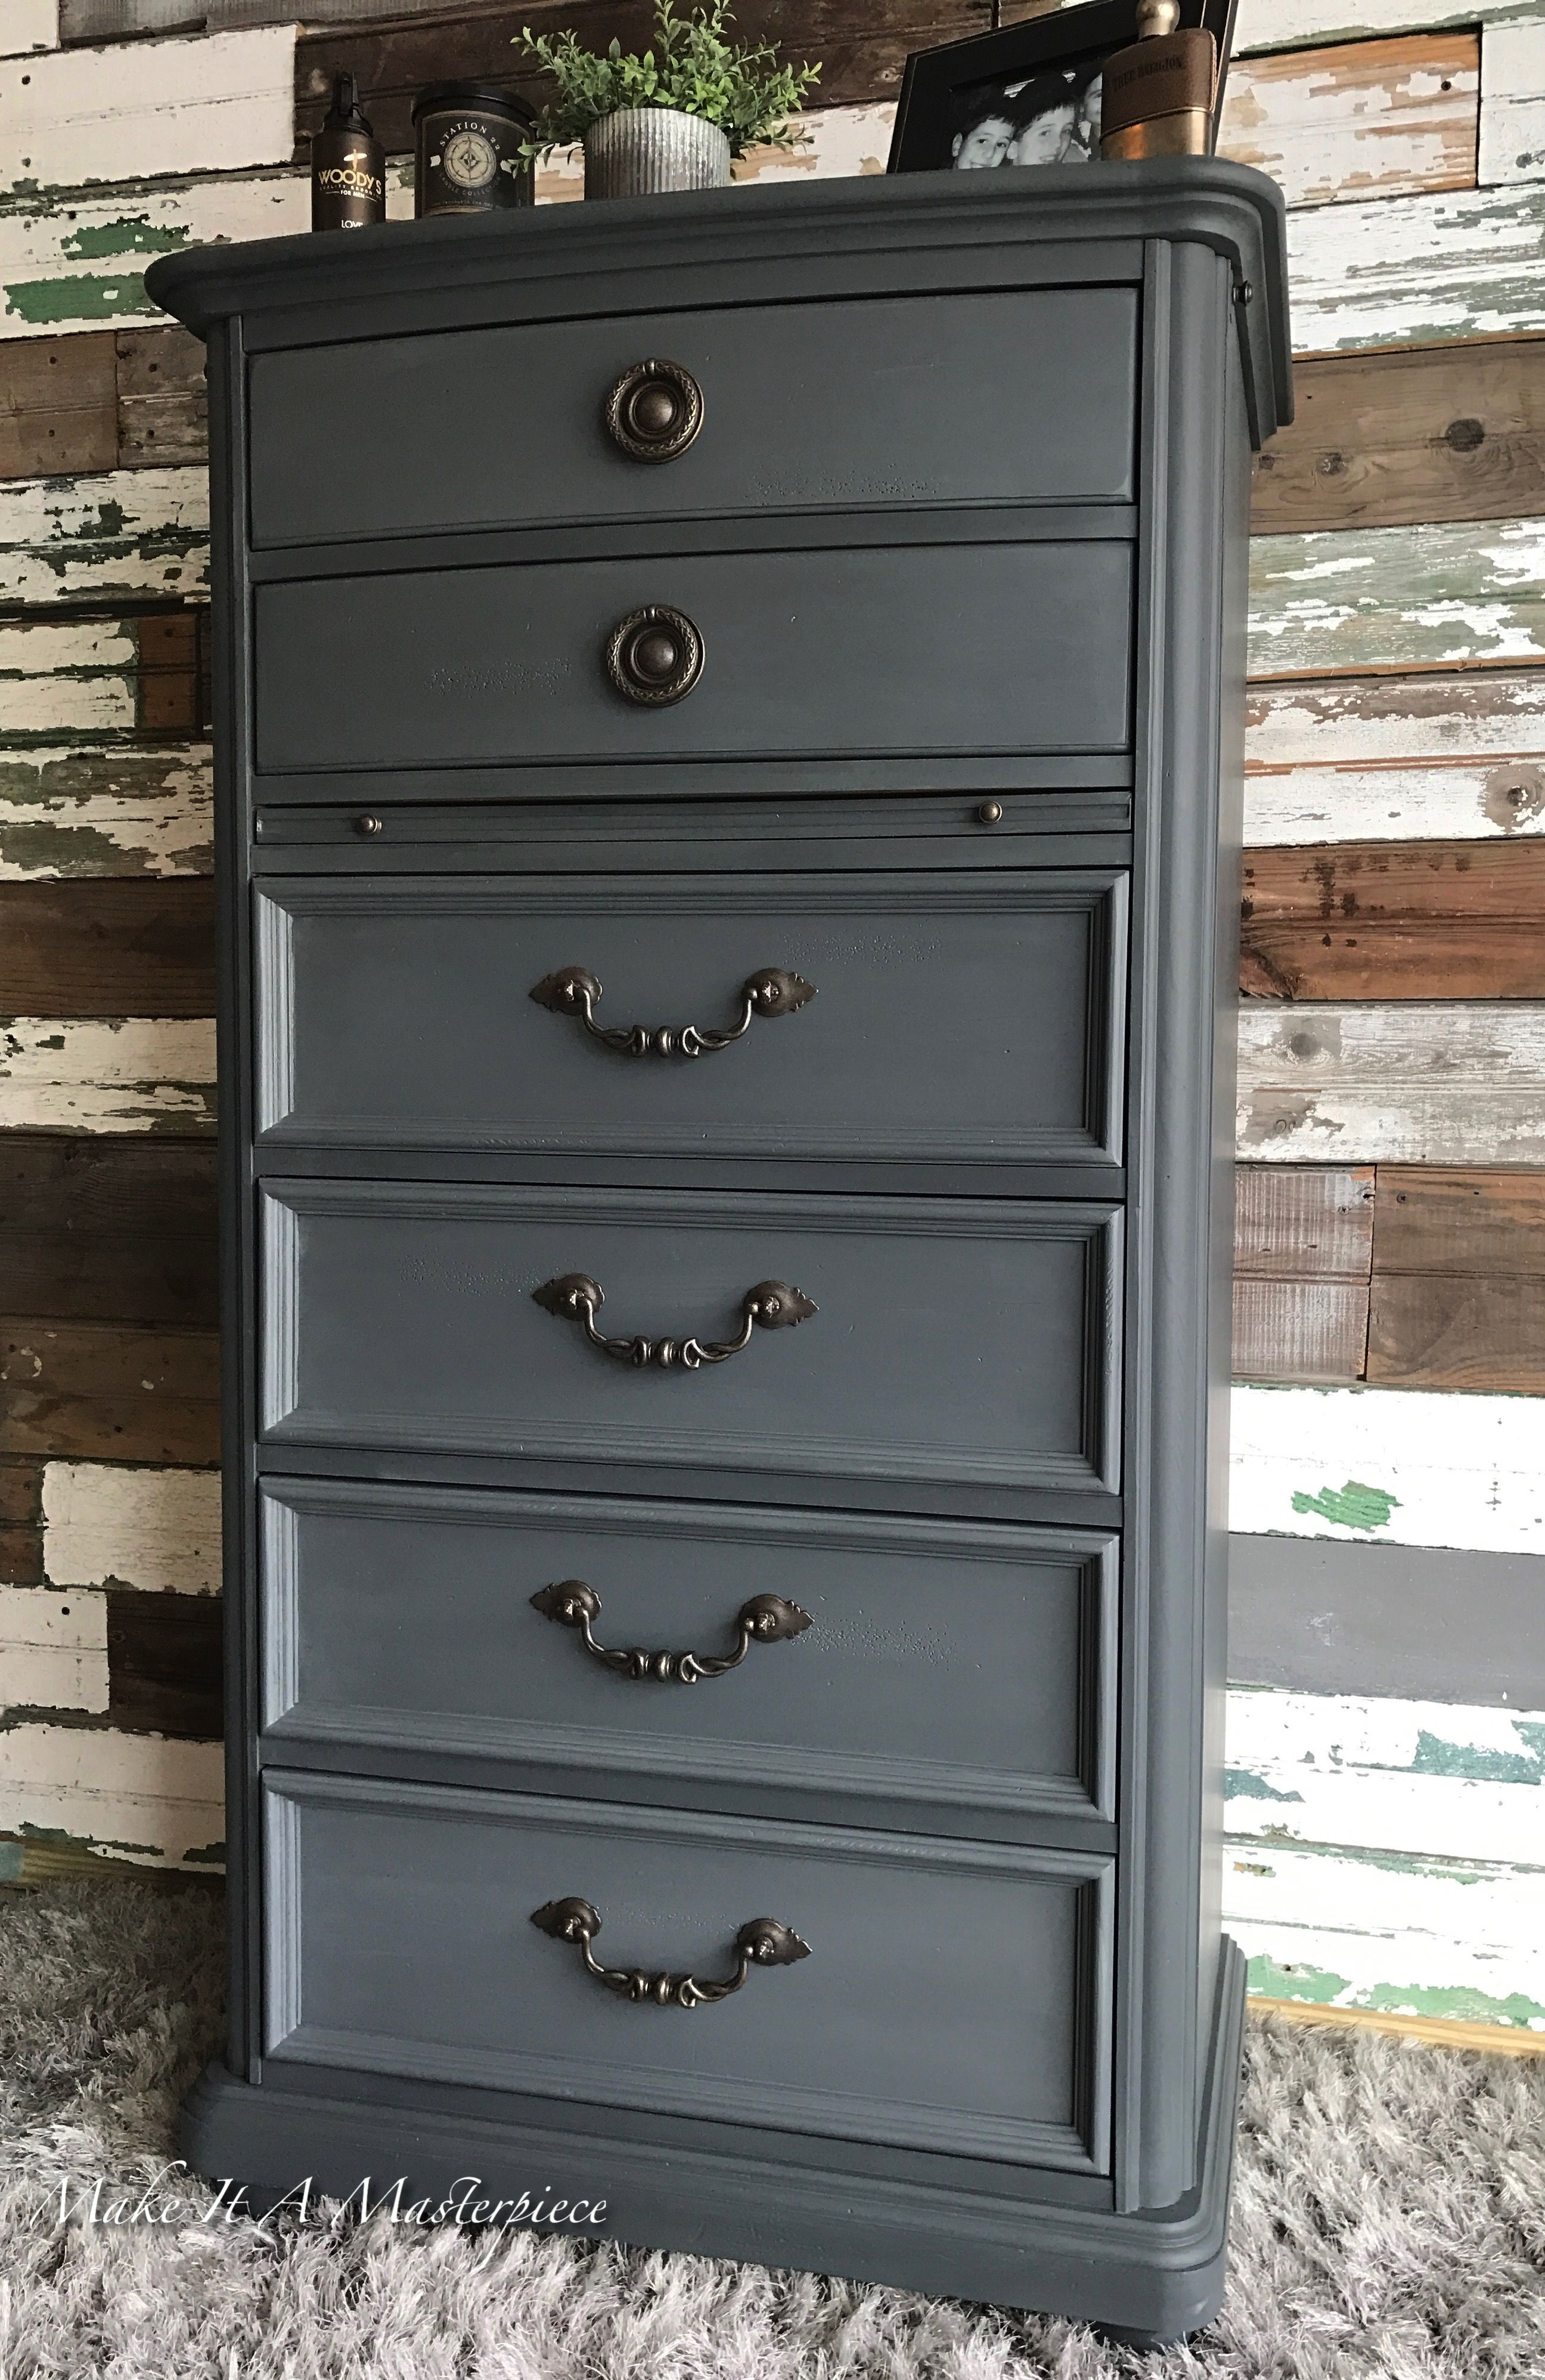 Gf Slate Gray Chalk Paint Gentleman S Chest Painted Furniture Colors Chalk Paint Colors Furniture Gray Chalk Paint